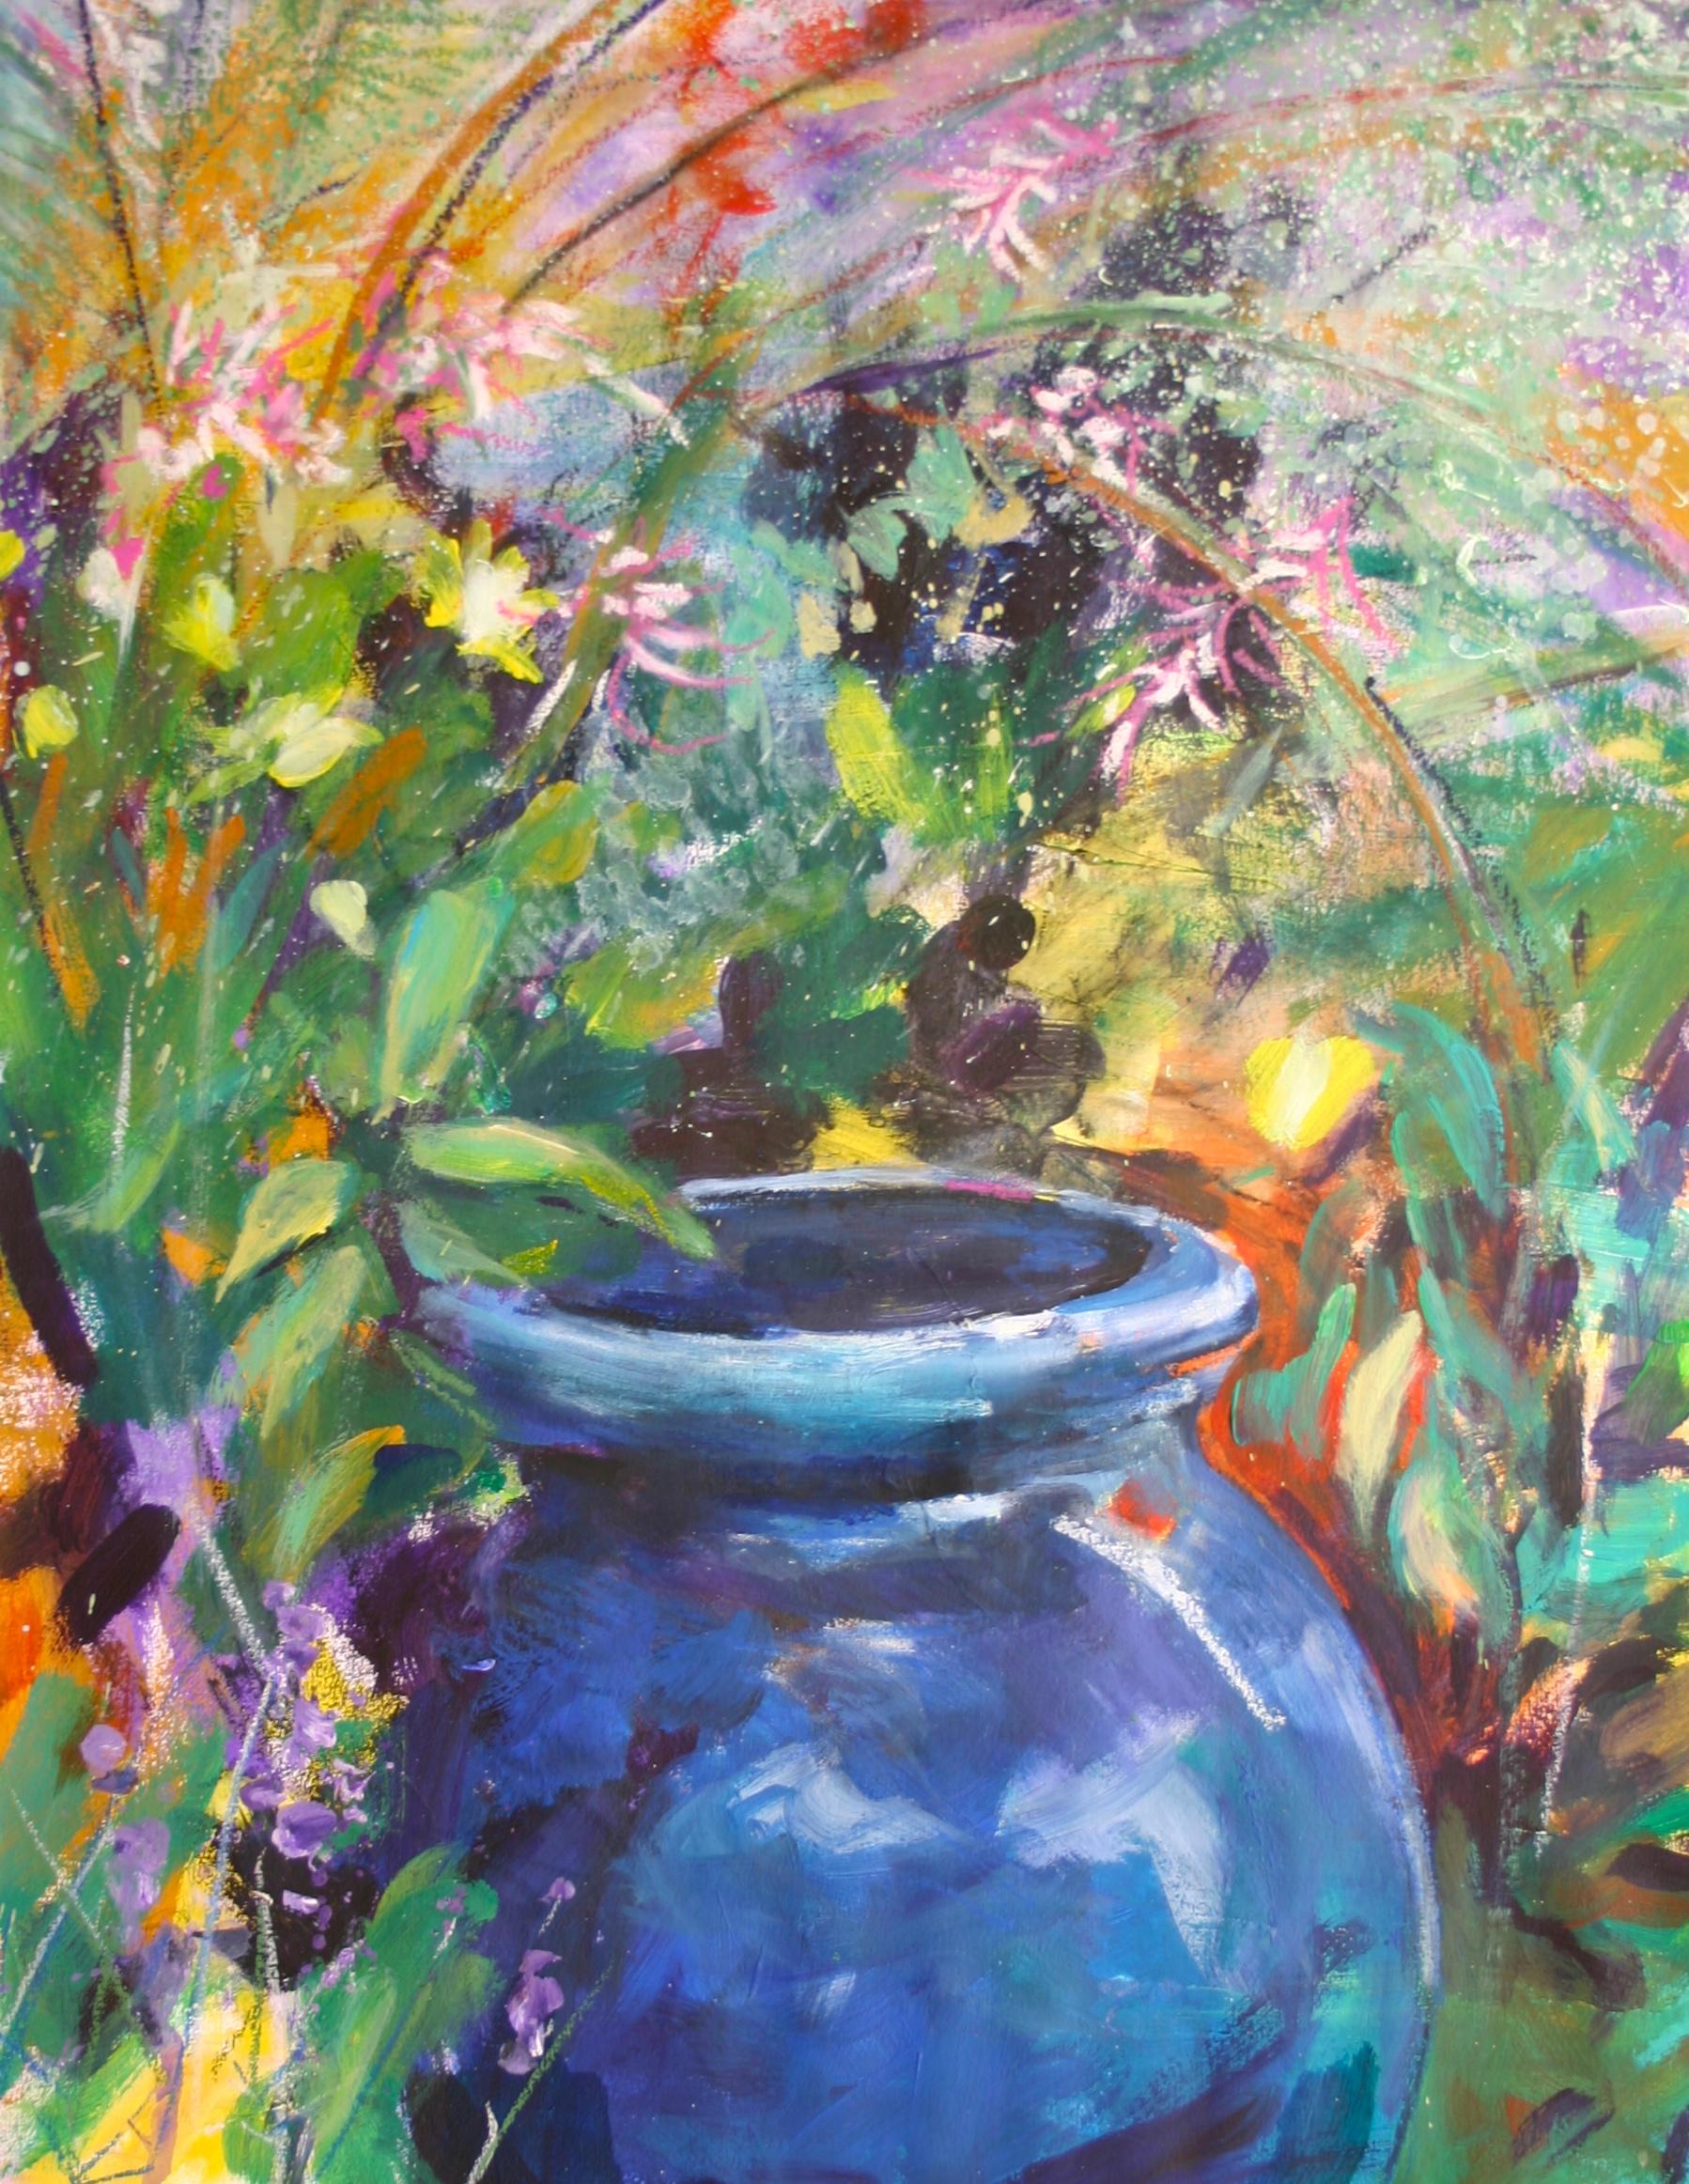 Blue Pot 9560